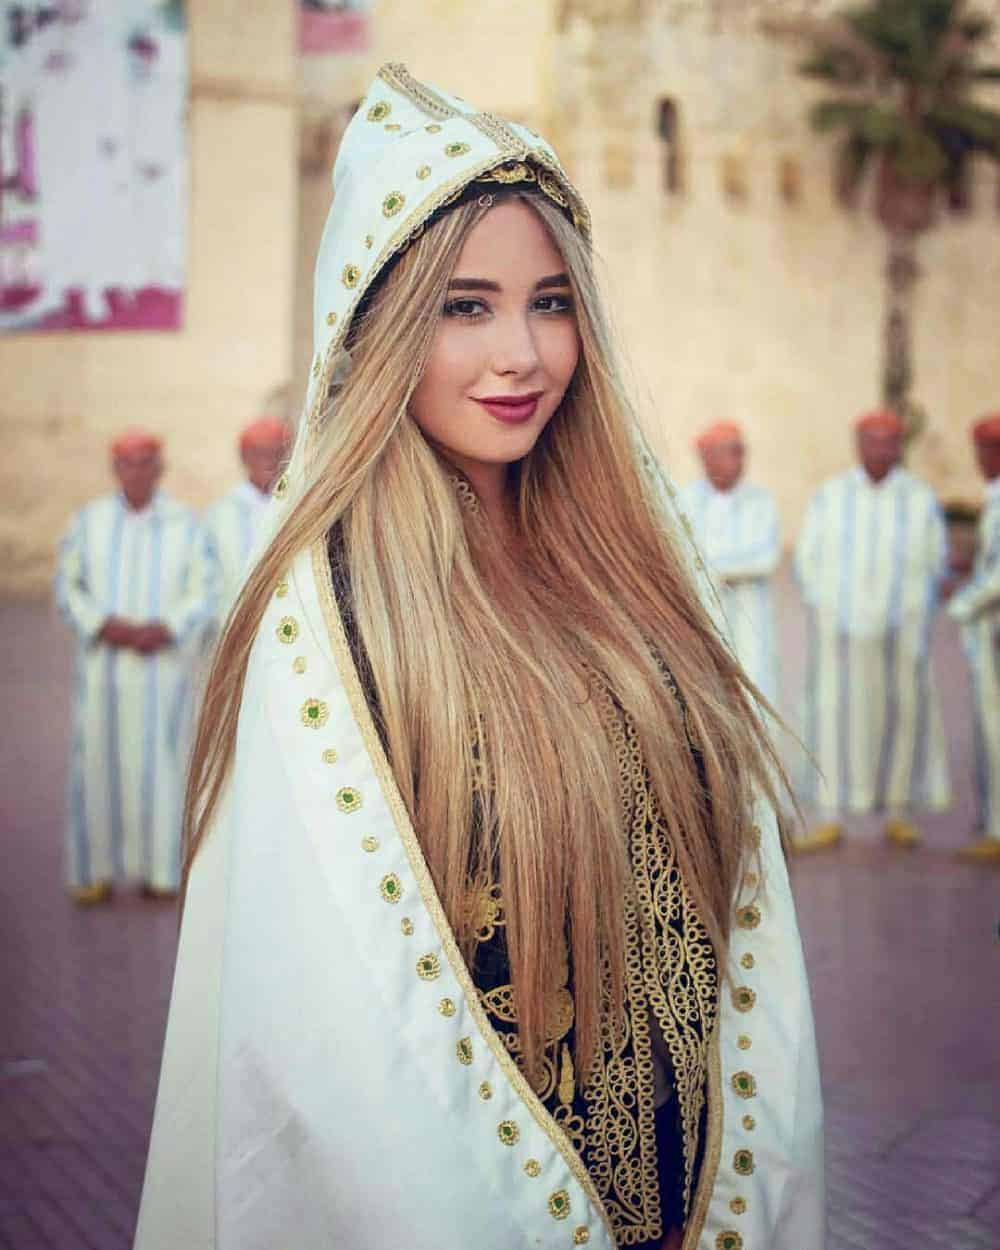 Sefrou cherry festival Morocco 2019